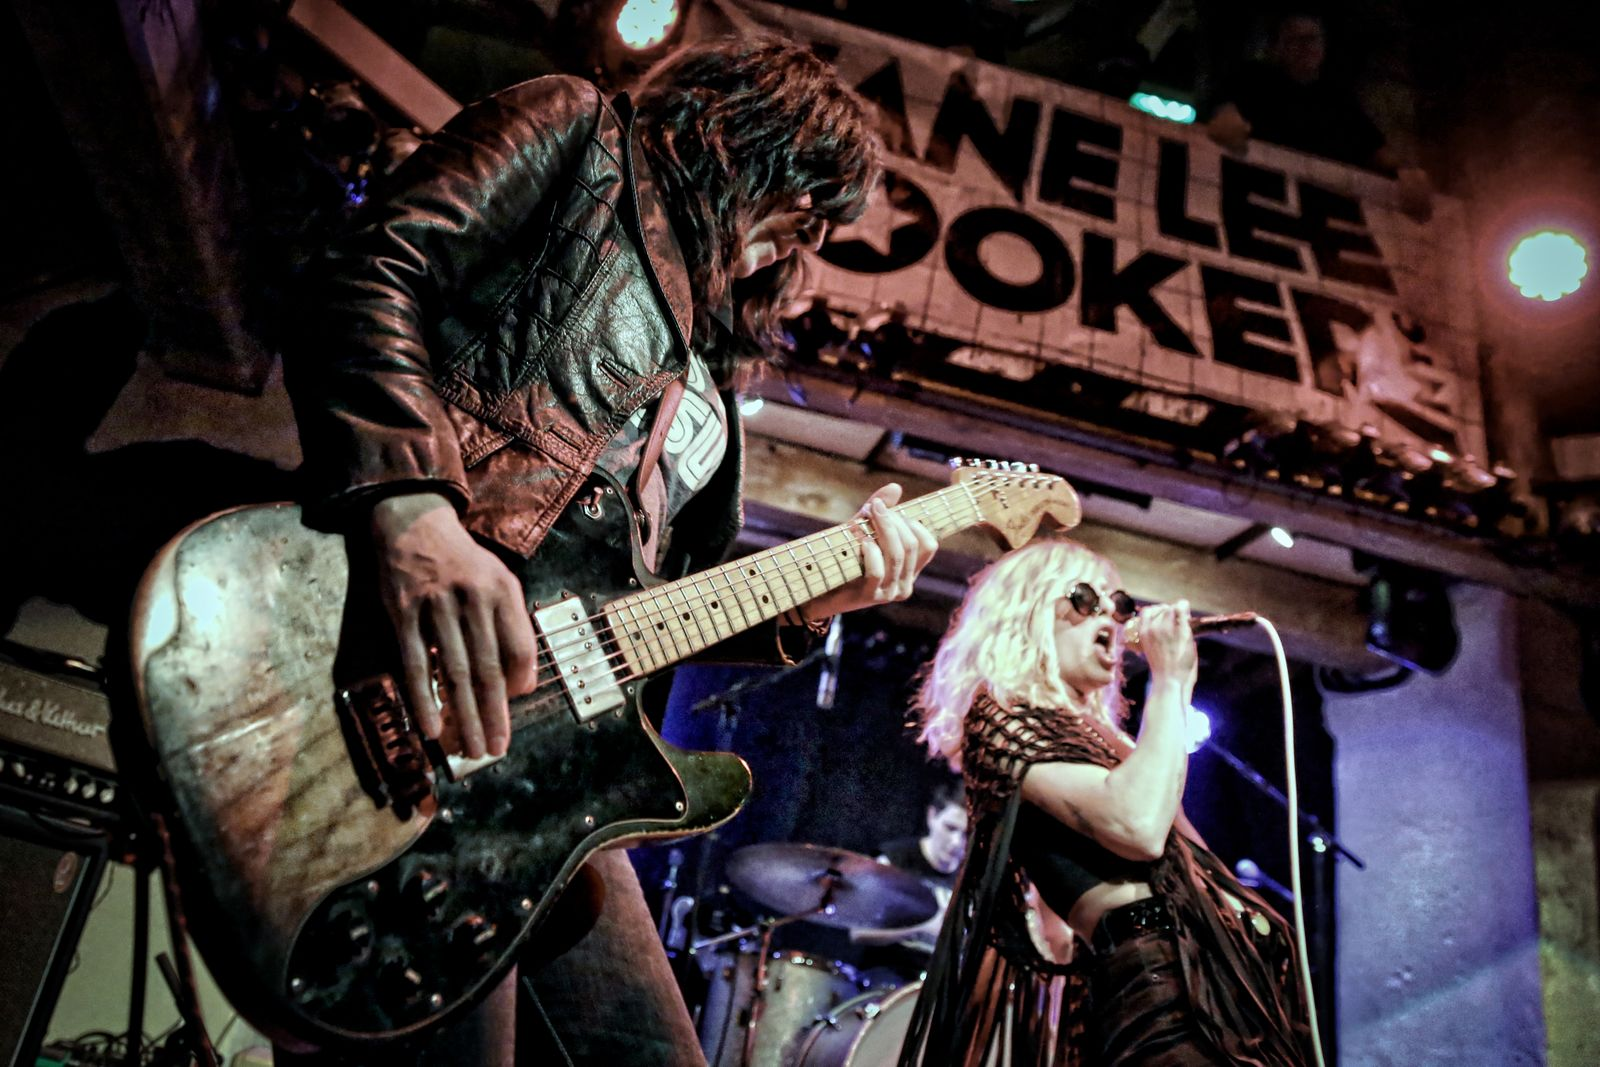 Jane Lee Hooker band